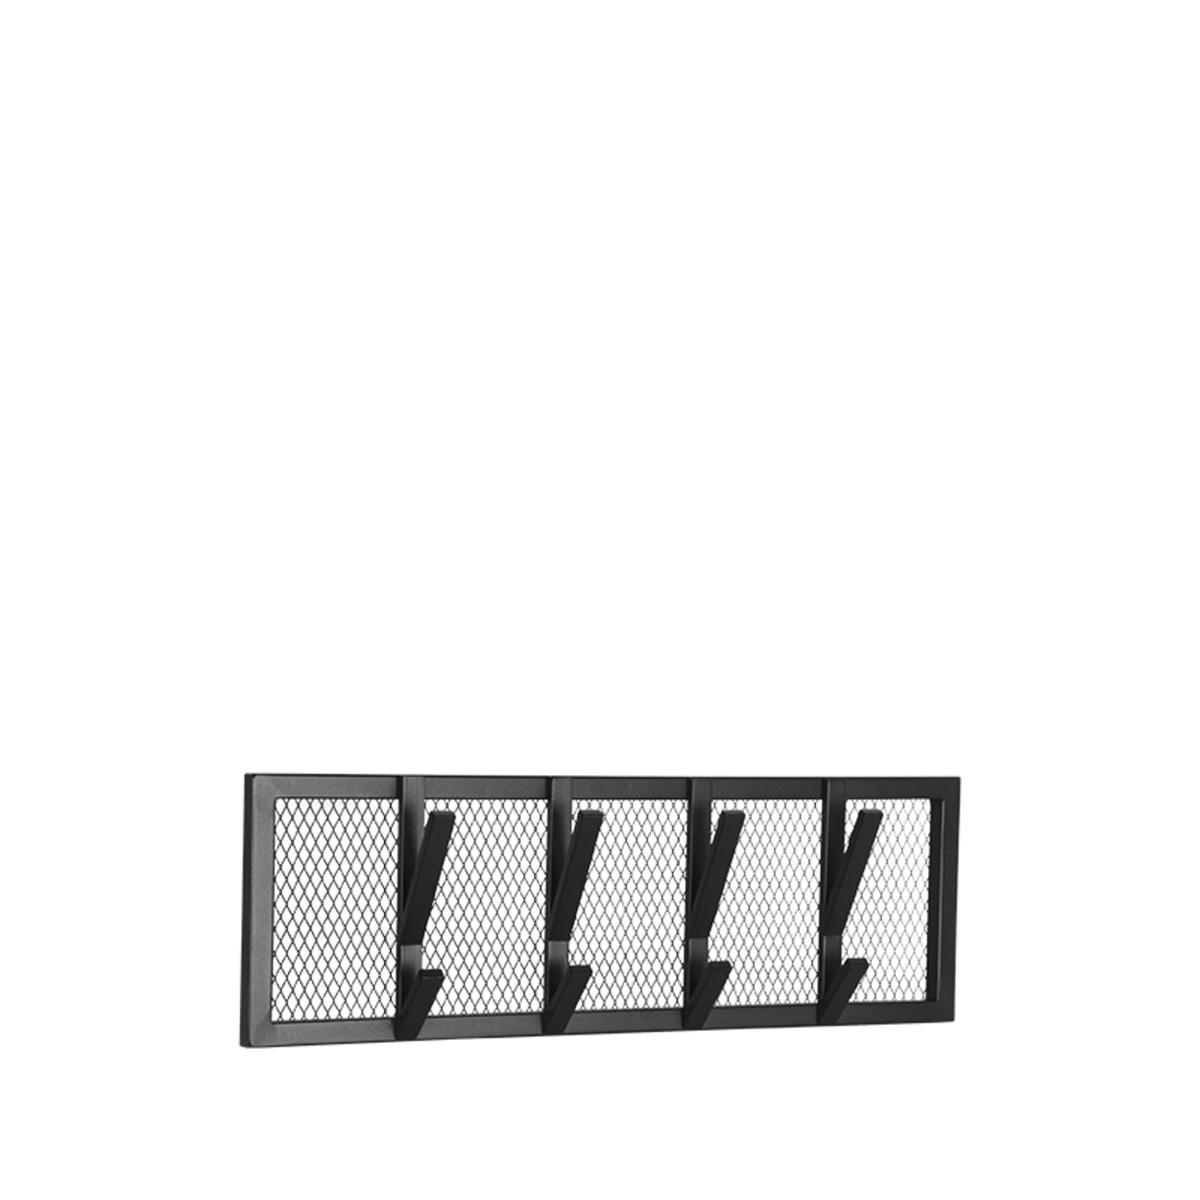 LABEL51 Kapstok Gruff - Zwart - Metaal - M